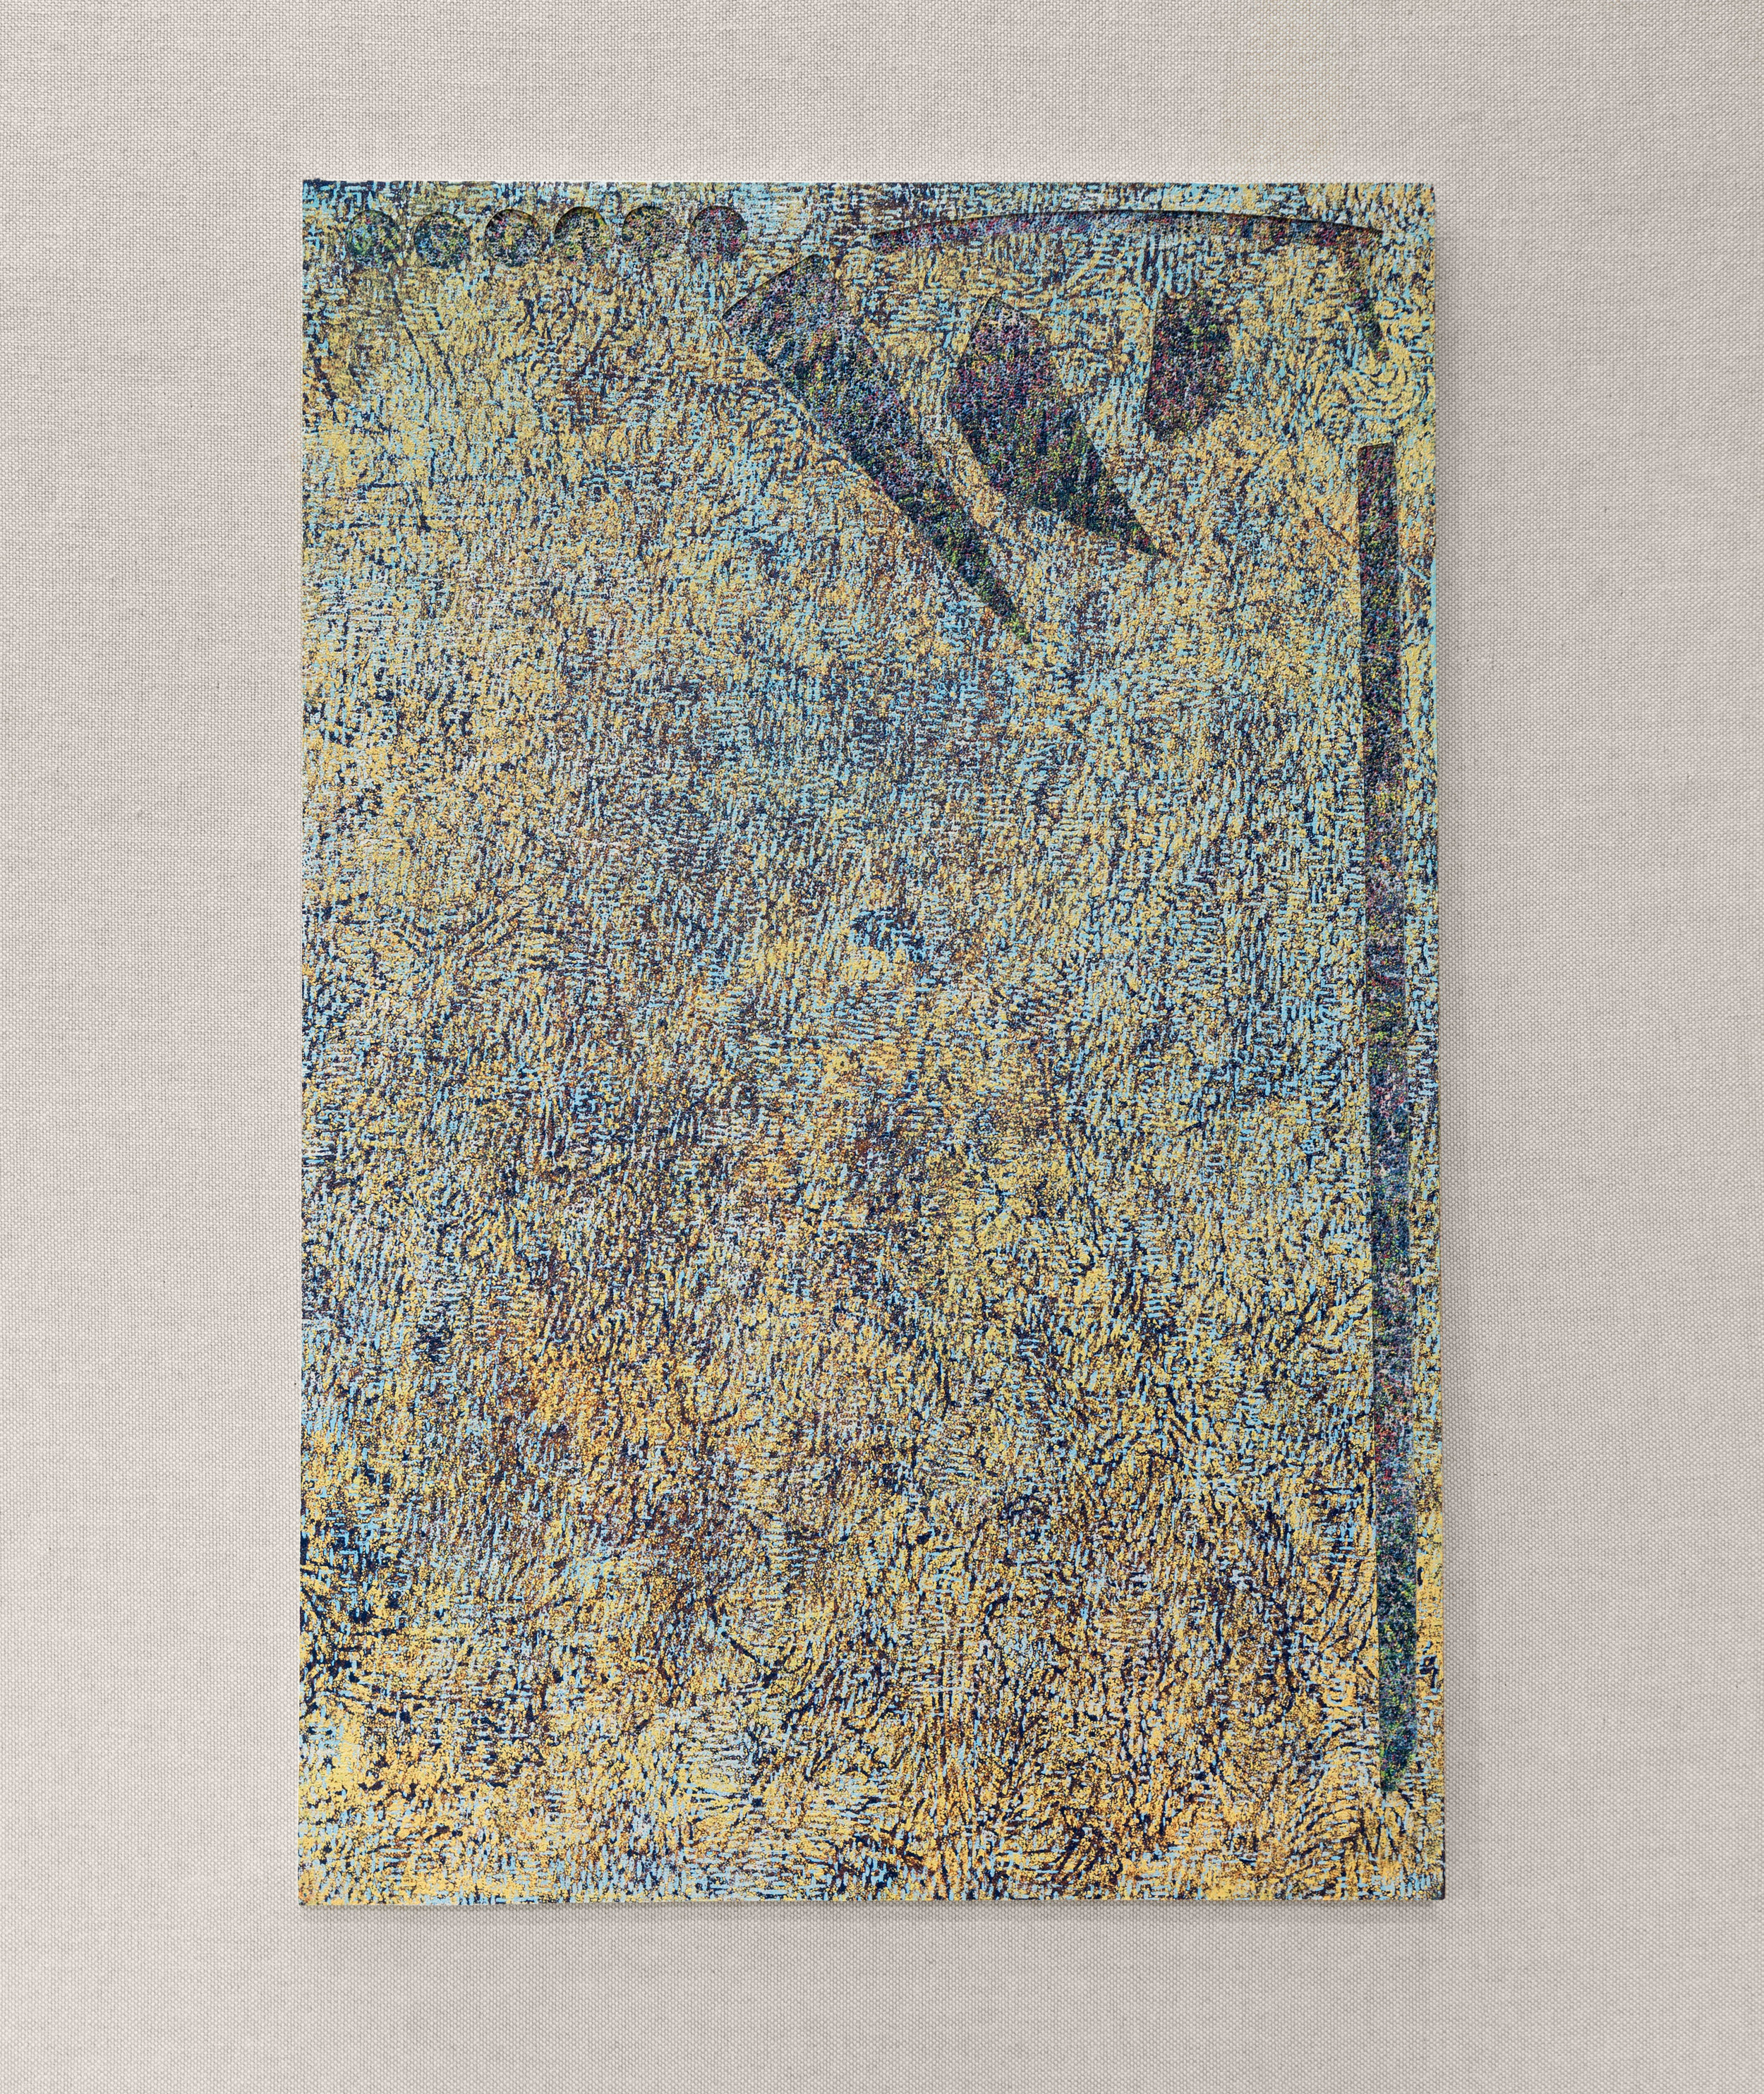 Field of Irisarri (Variation 3), Woodblock print & MDF board, Shoreline Community College, 2017